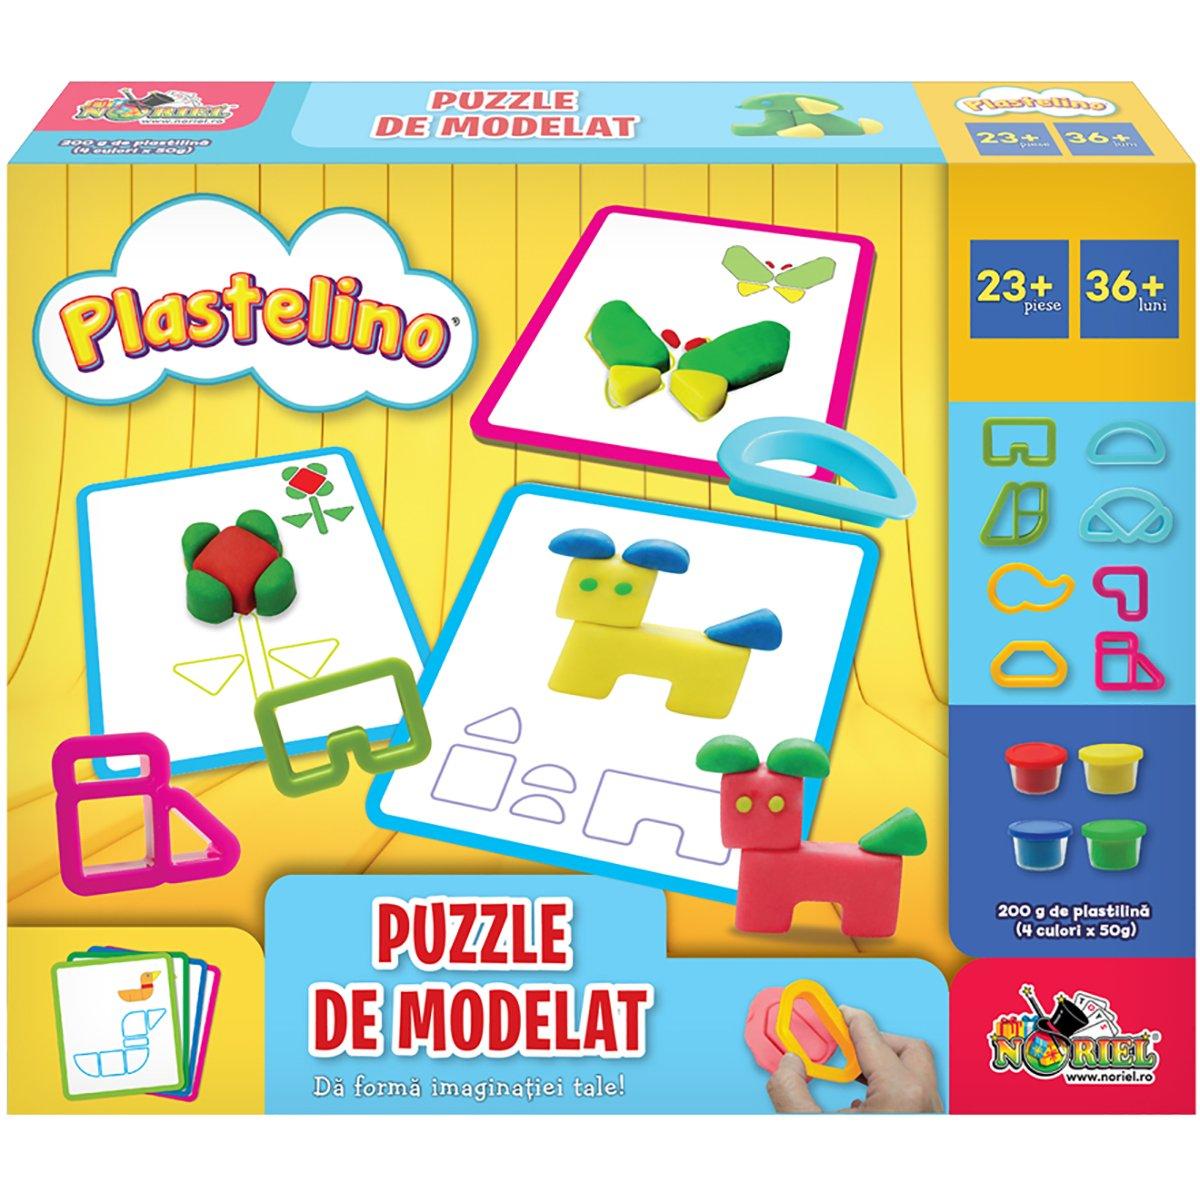 Set de joaca Plastelino, Puzzle de modelat